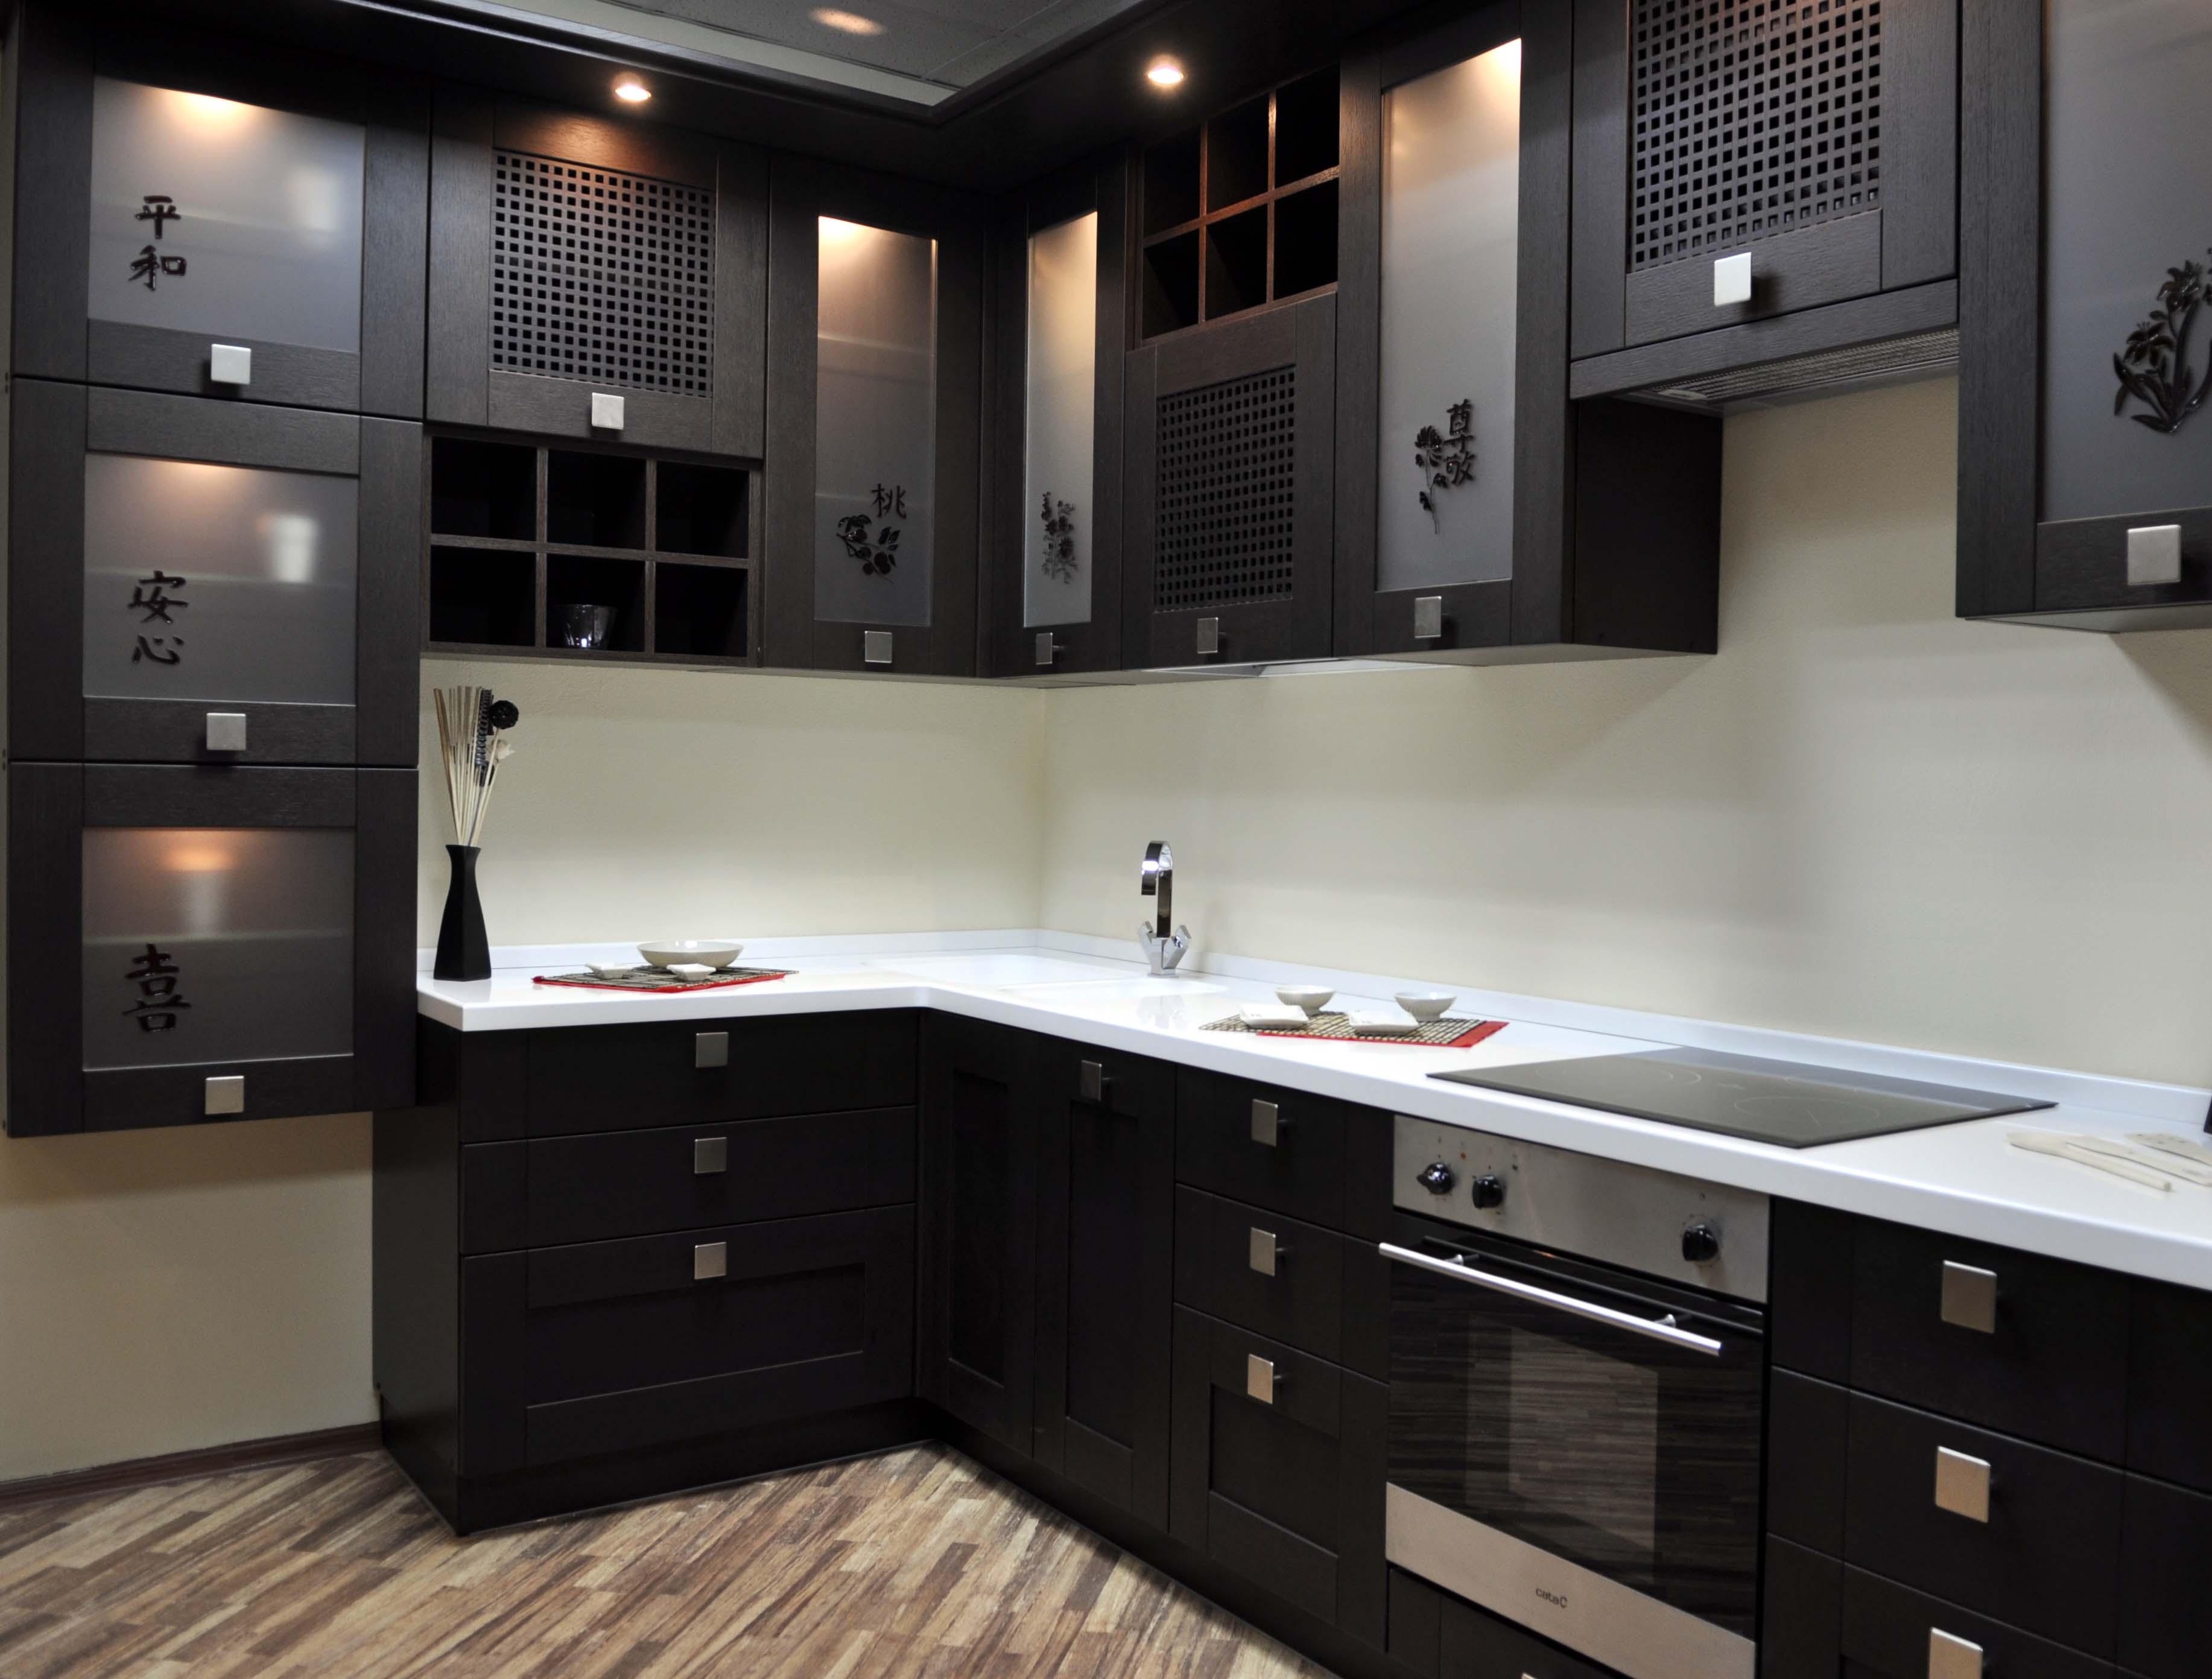 necessary_furniture_in_the_kitchen-04